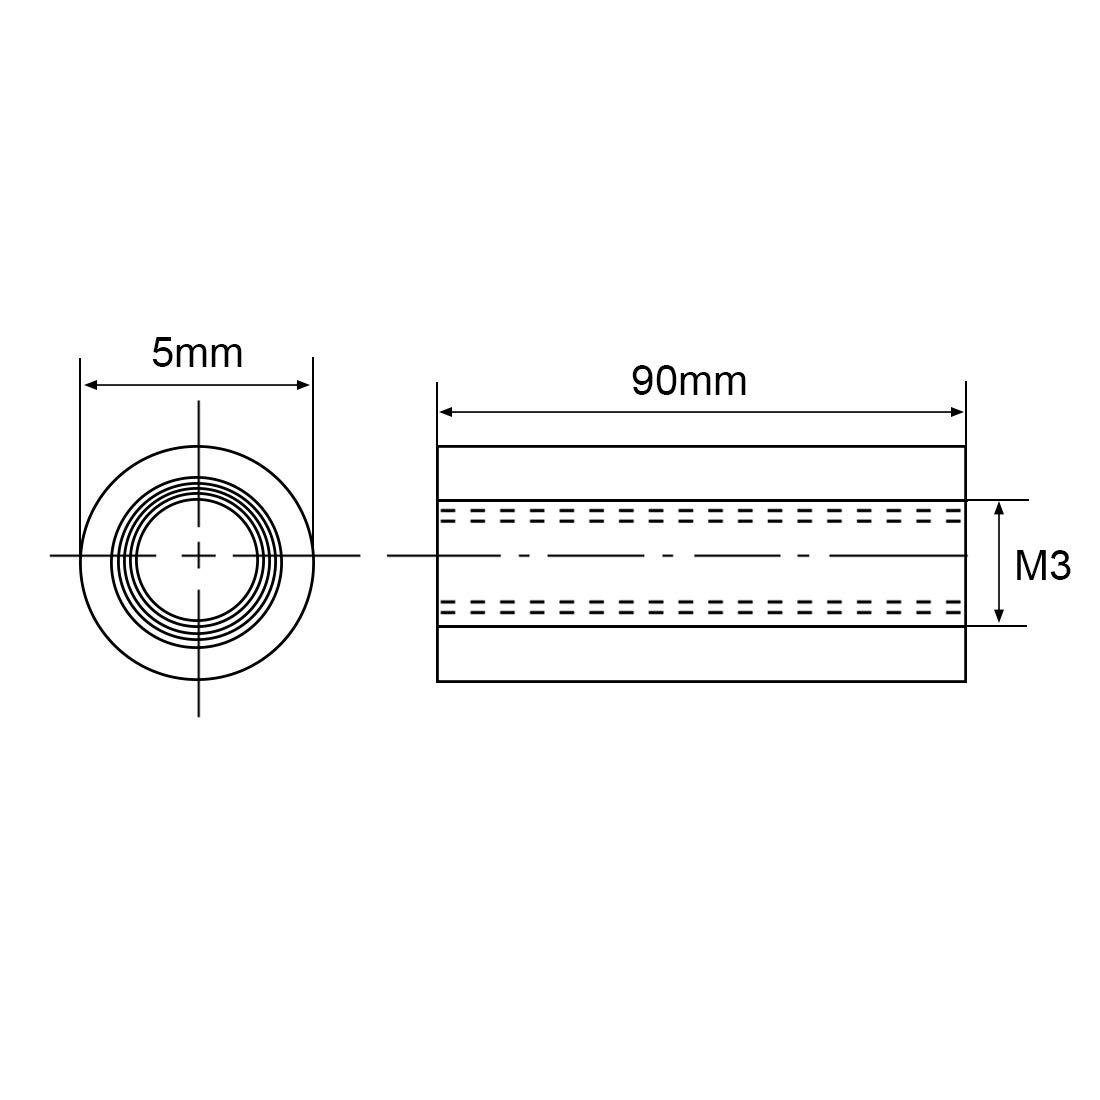 uxcell Round Aluminum Standoff Column Spacer M3x55mm,for RC Airplane,FPV Quadcopter,CNC,Black,10pcs